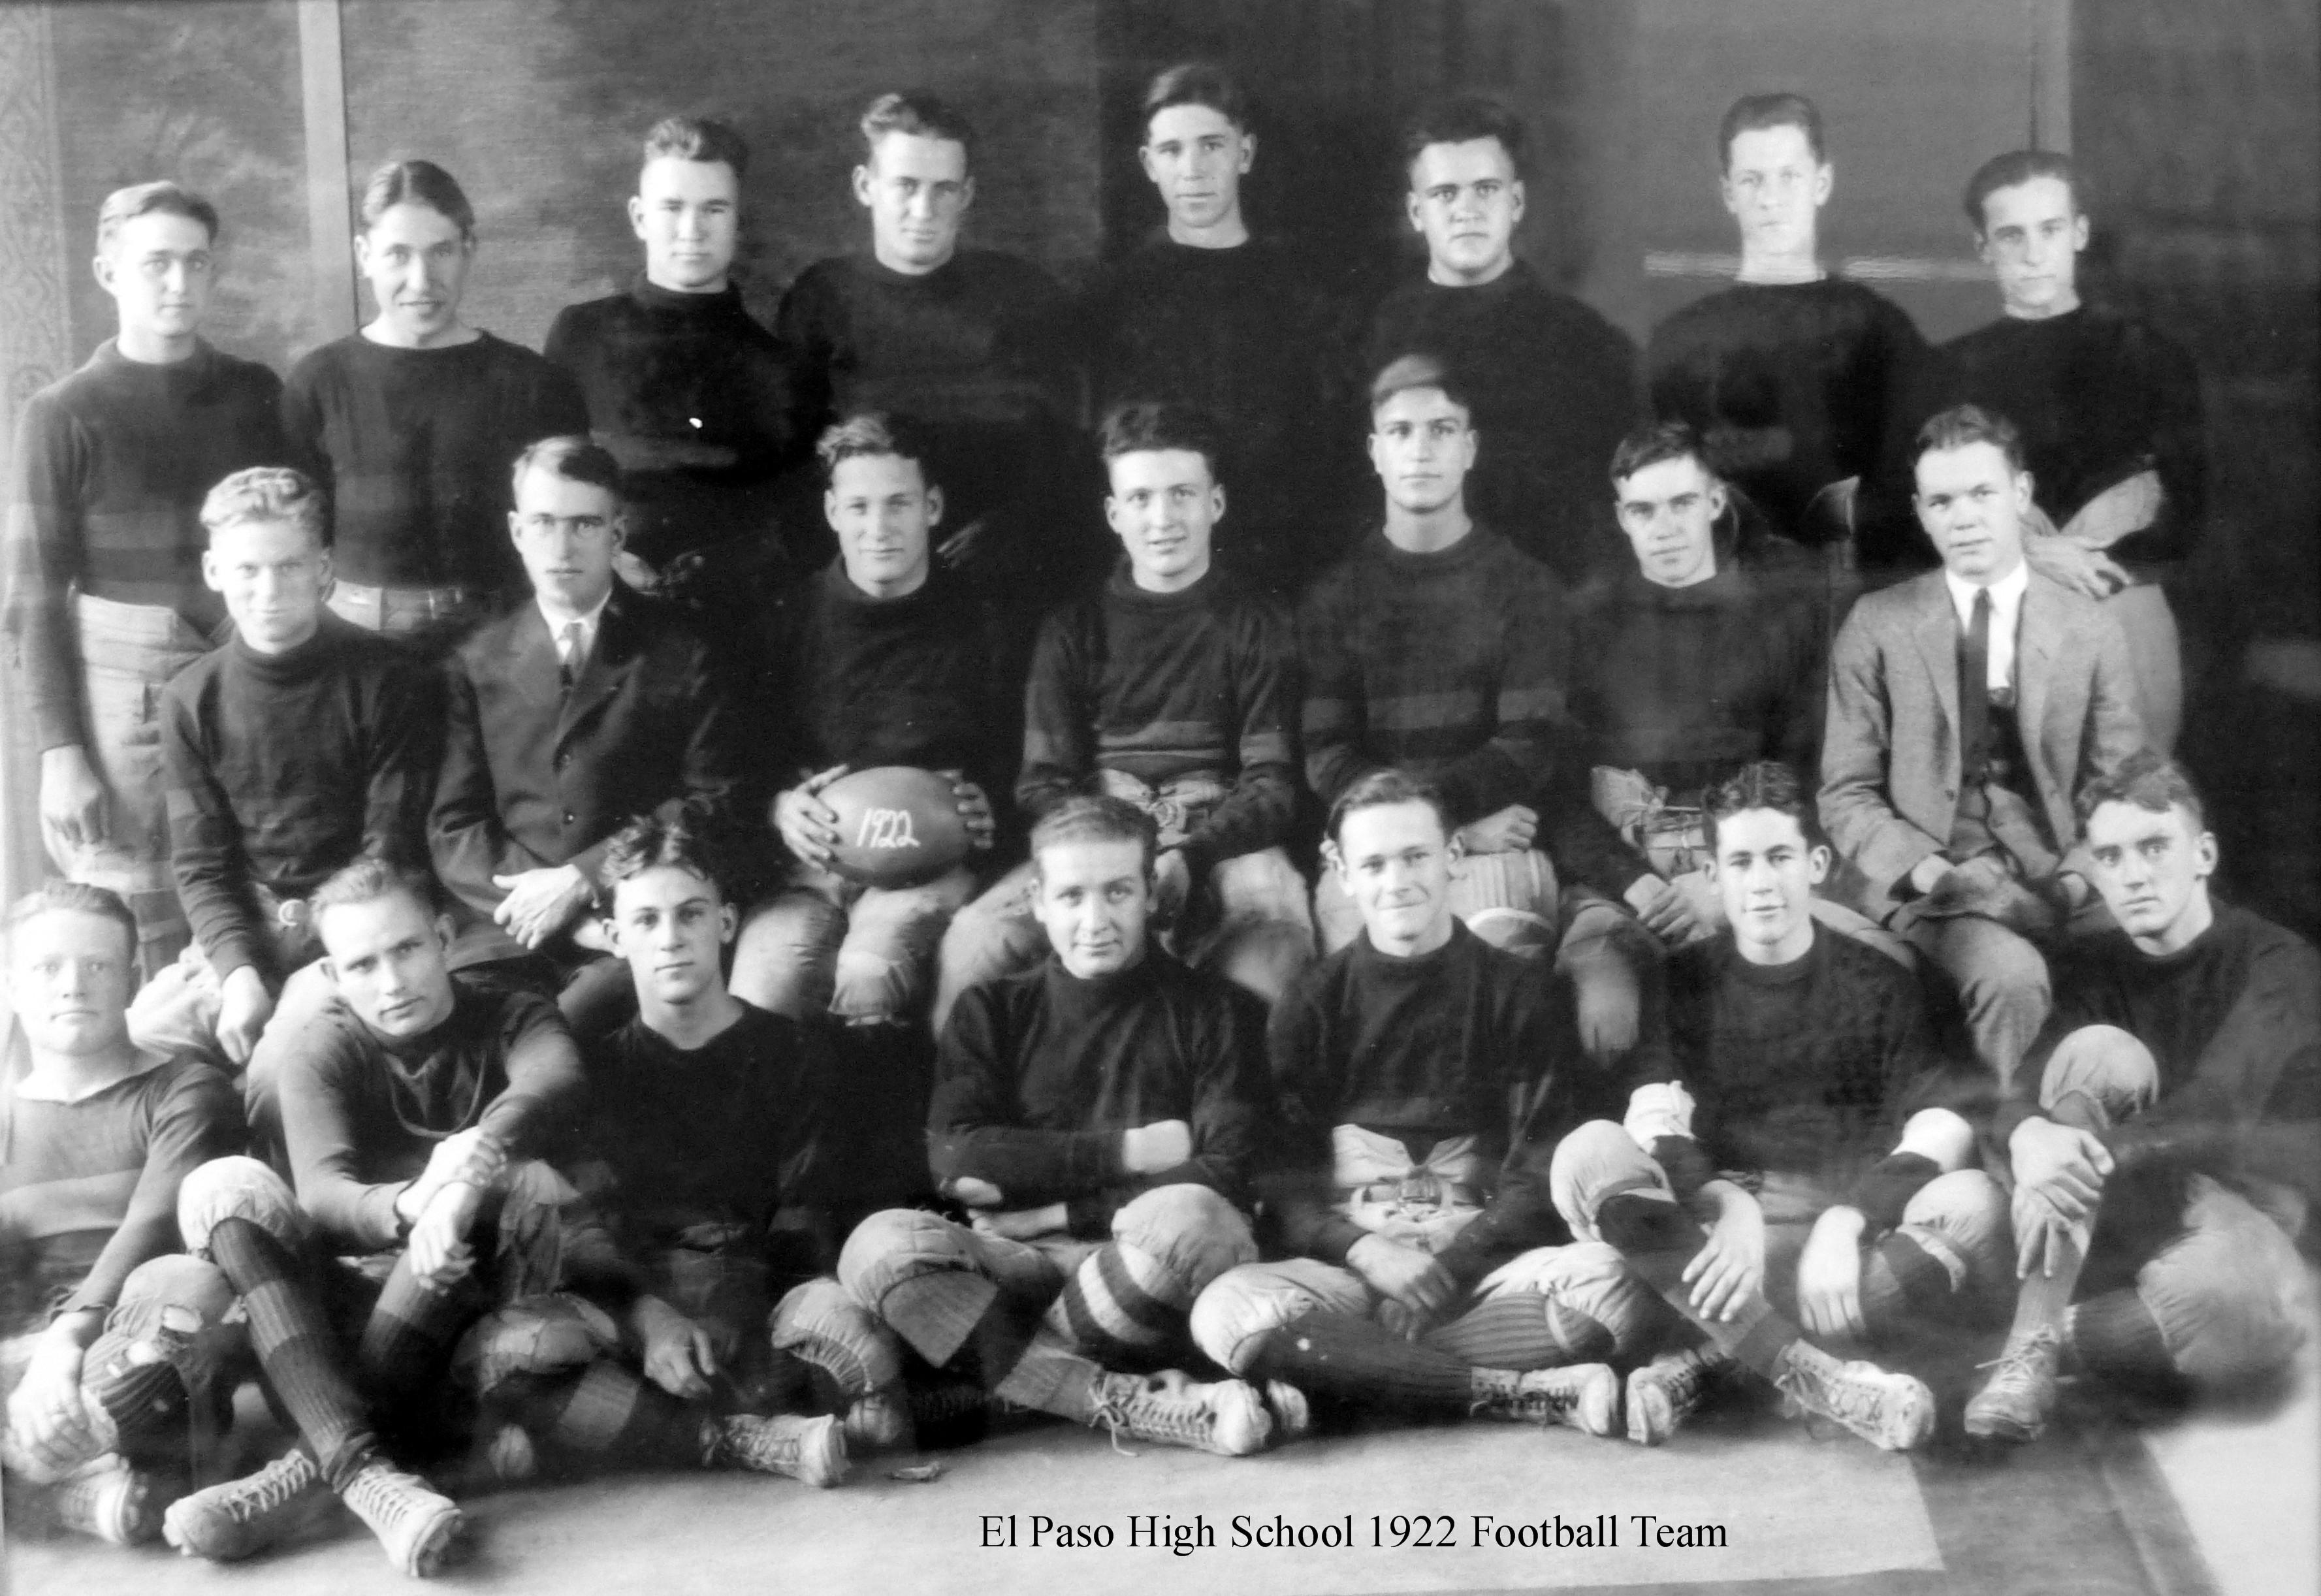 EPHS_1922 Football Team